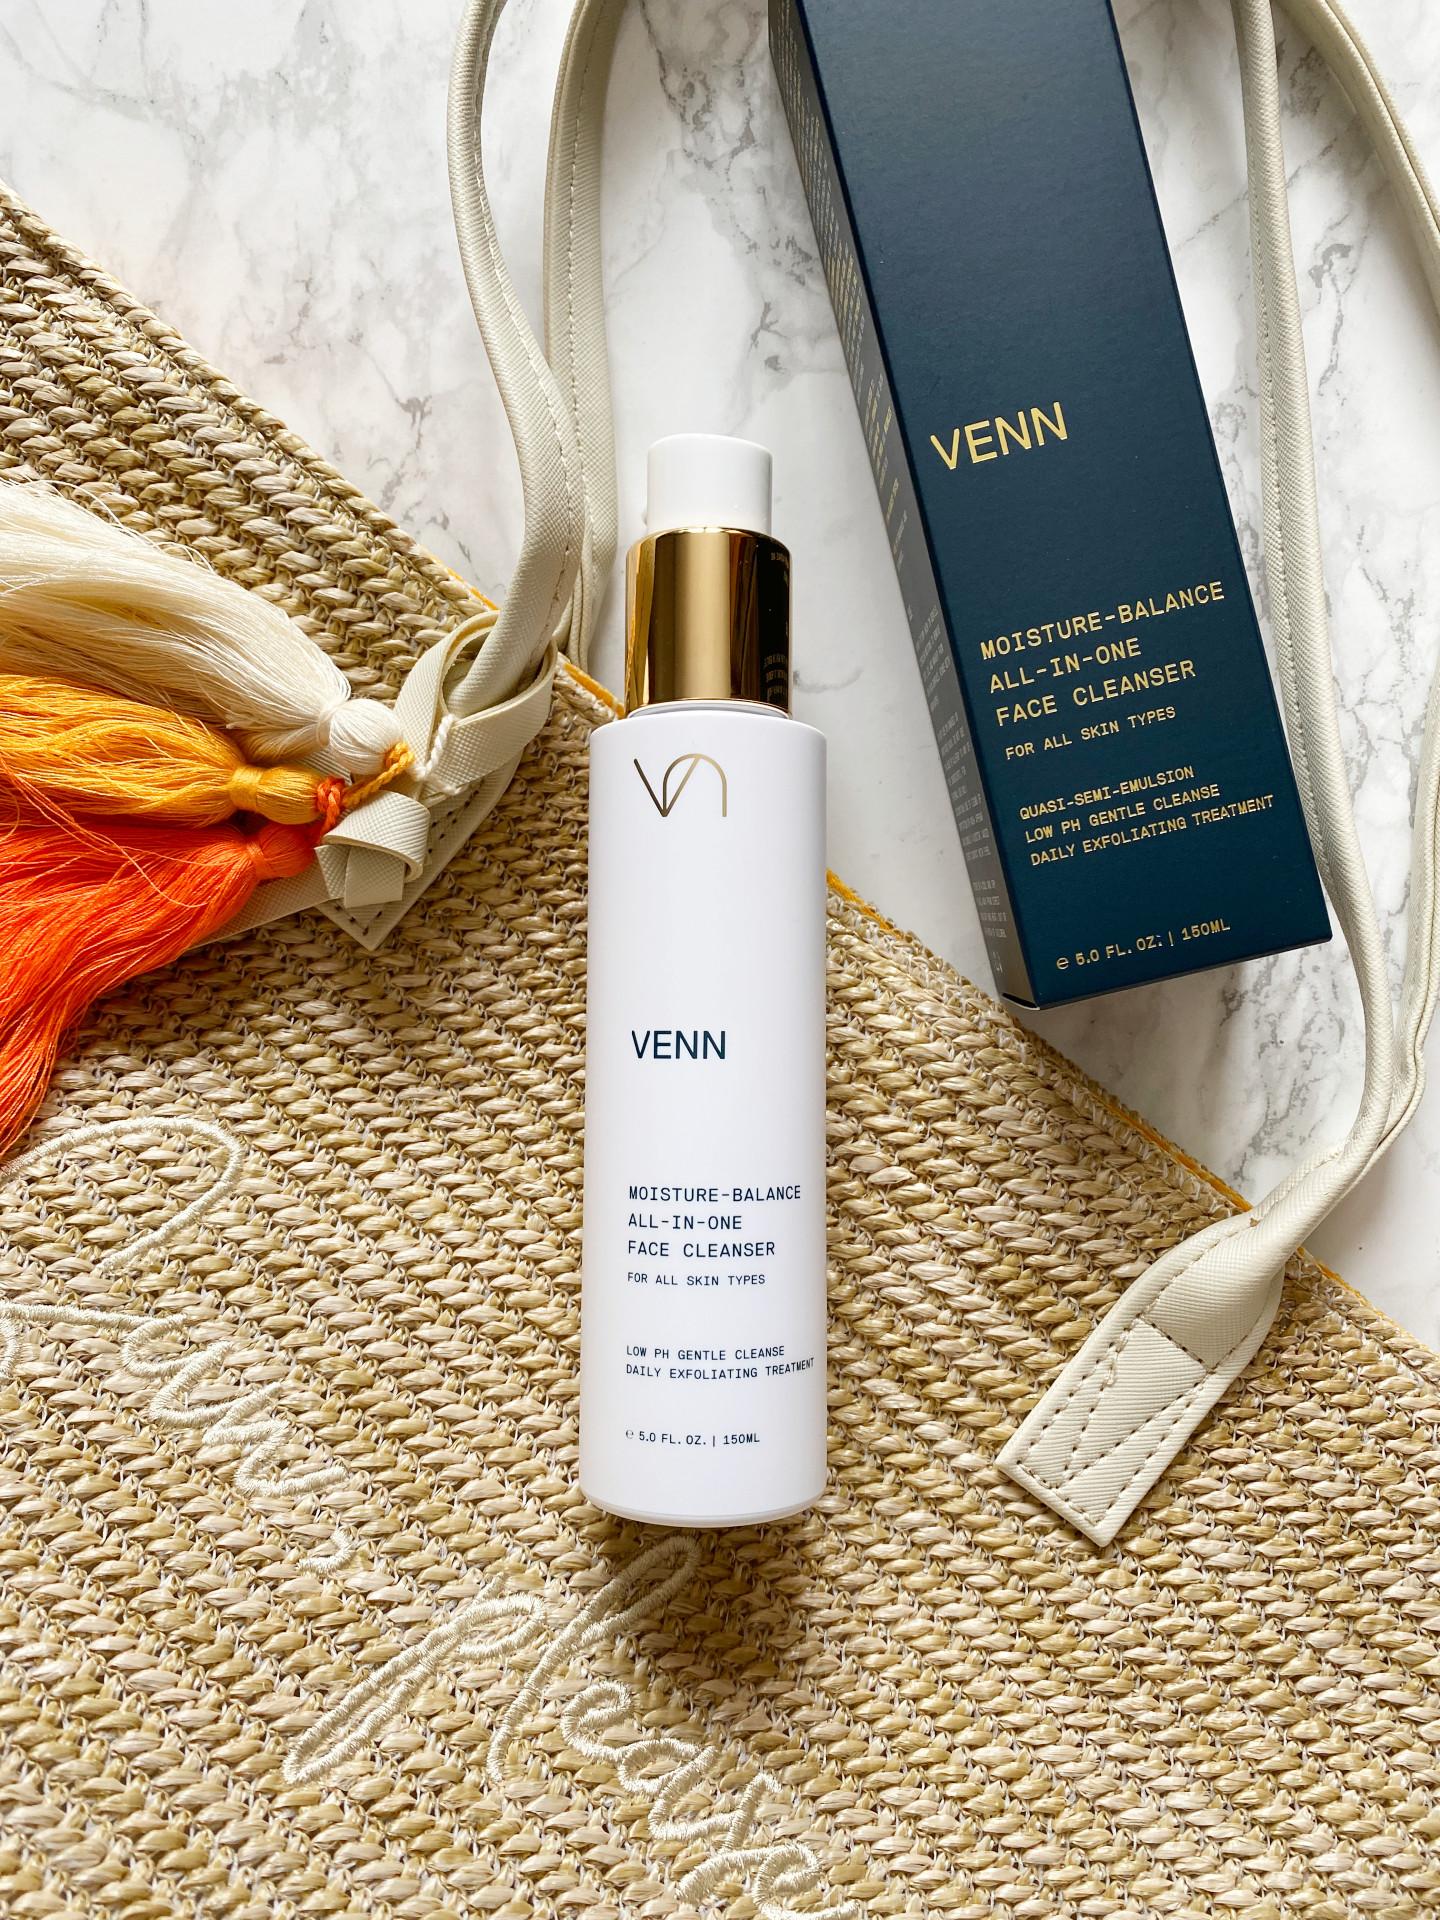 venn moisture balance all in one cleanser review